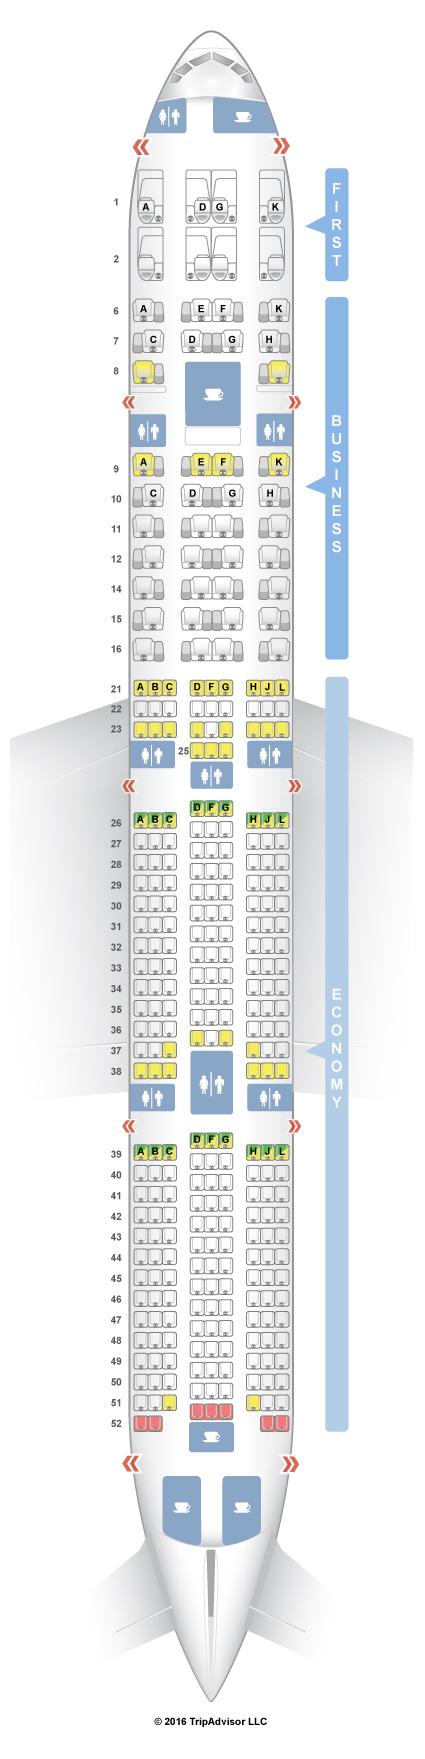 Seatguru Seat Map Garuda Indonesia